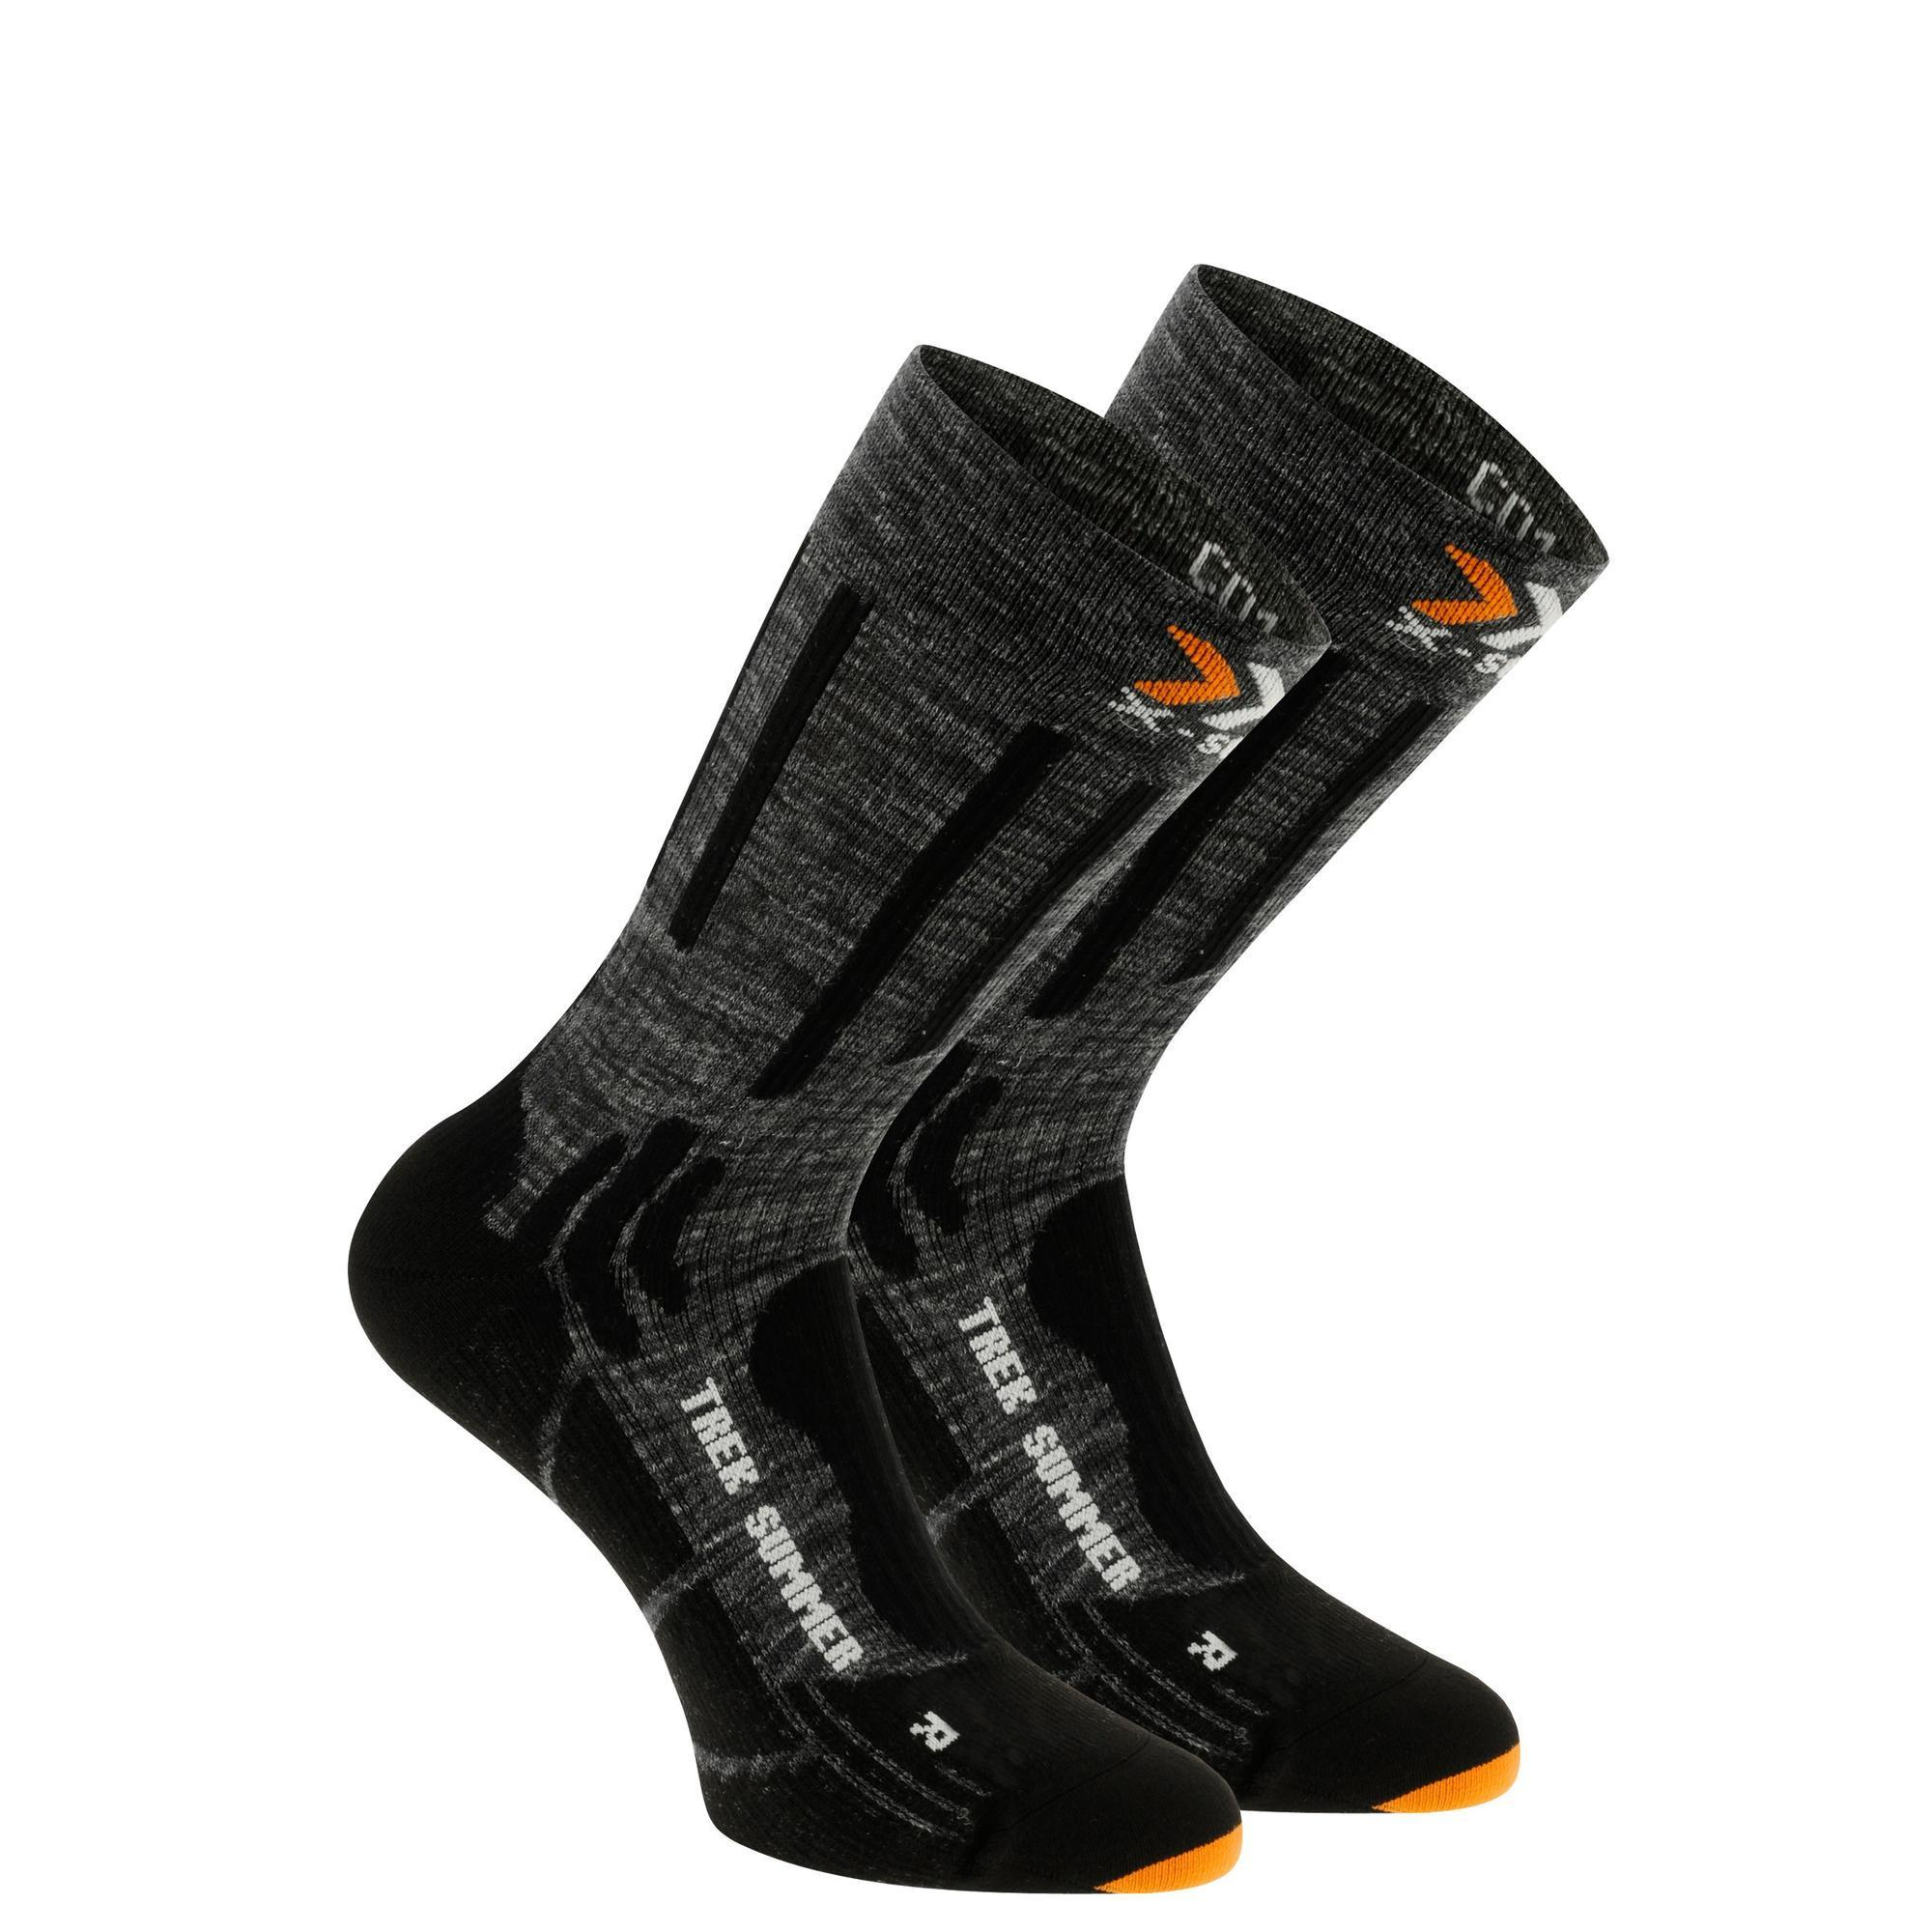 Wandersocken X-Socks light Erwachsene | Sportbekleidung > Funktionswäsche > Wandersocken | Sidas